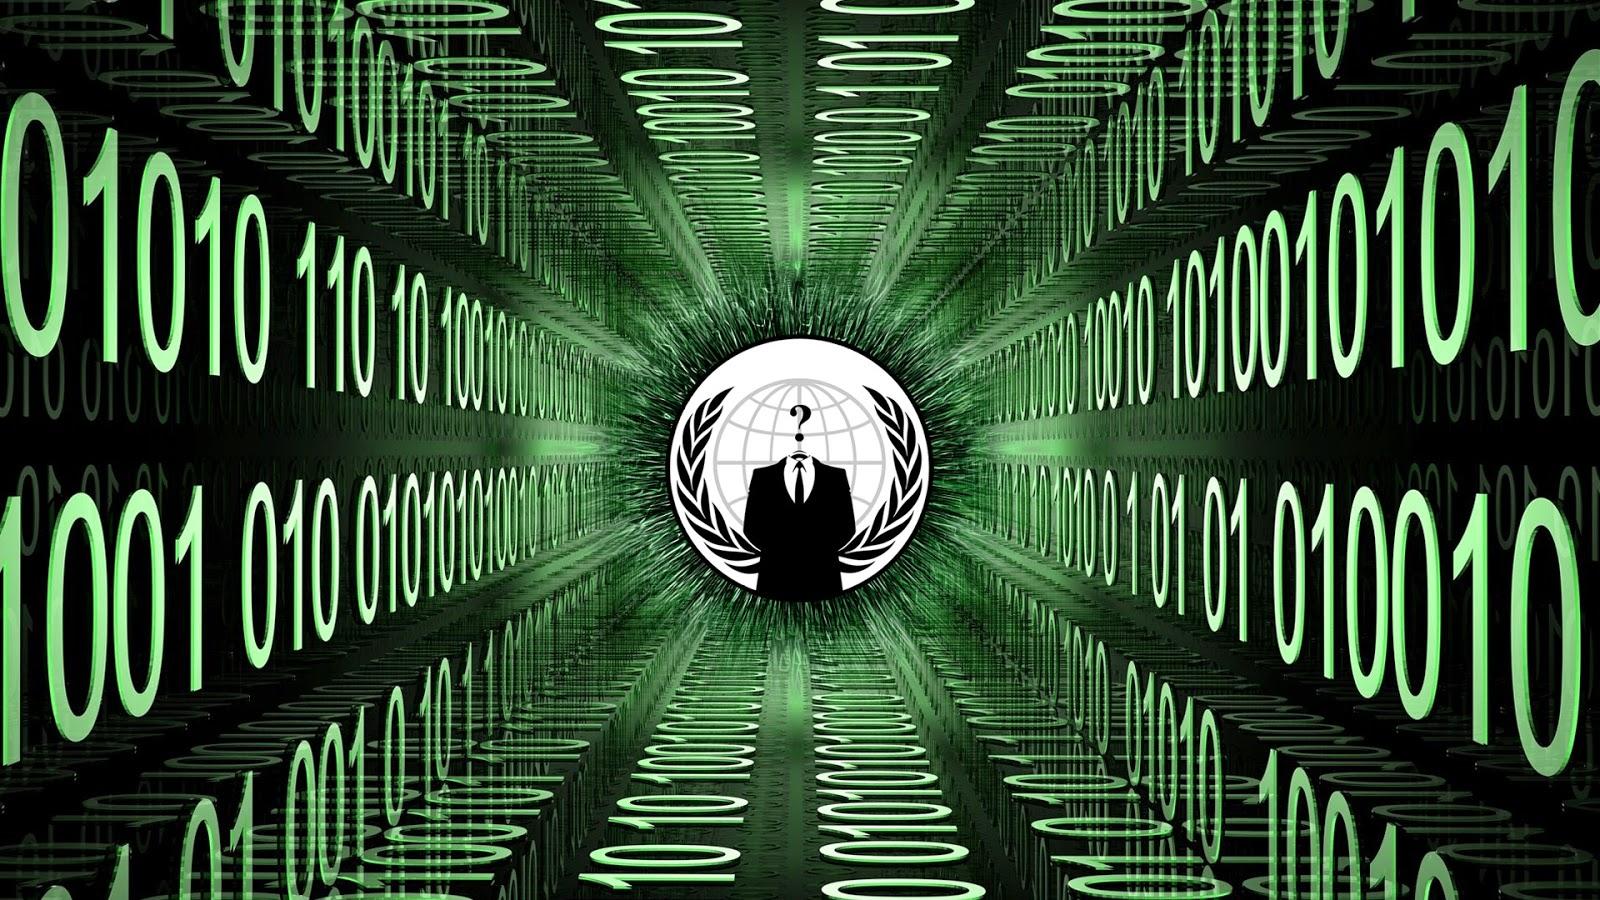 Hackers Wallpaper HD By Pcbots   Part X PCbots Labs Blog 1600x900